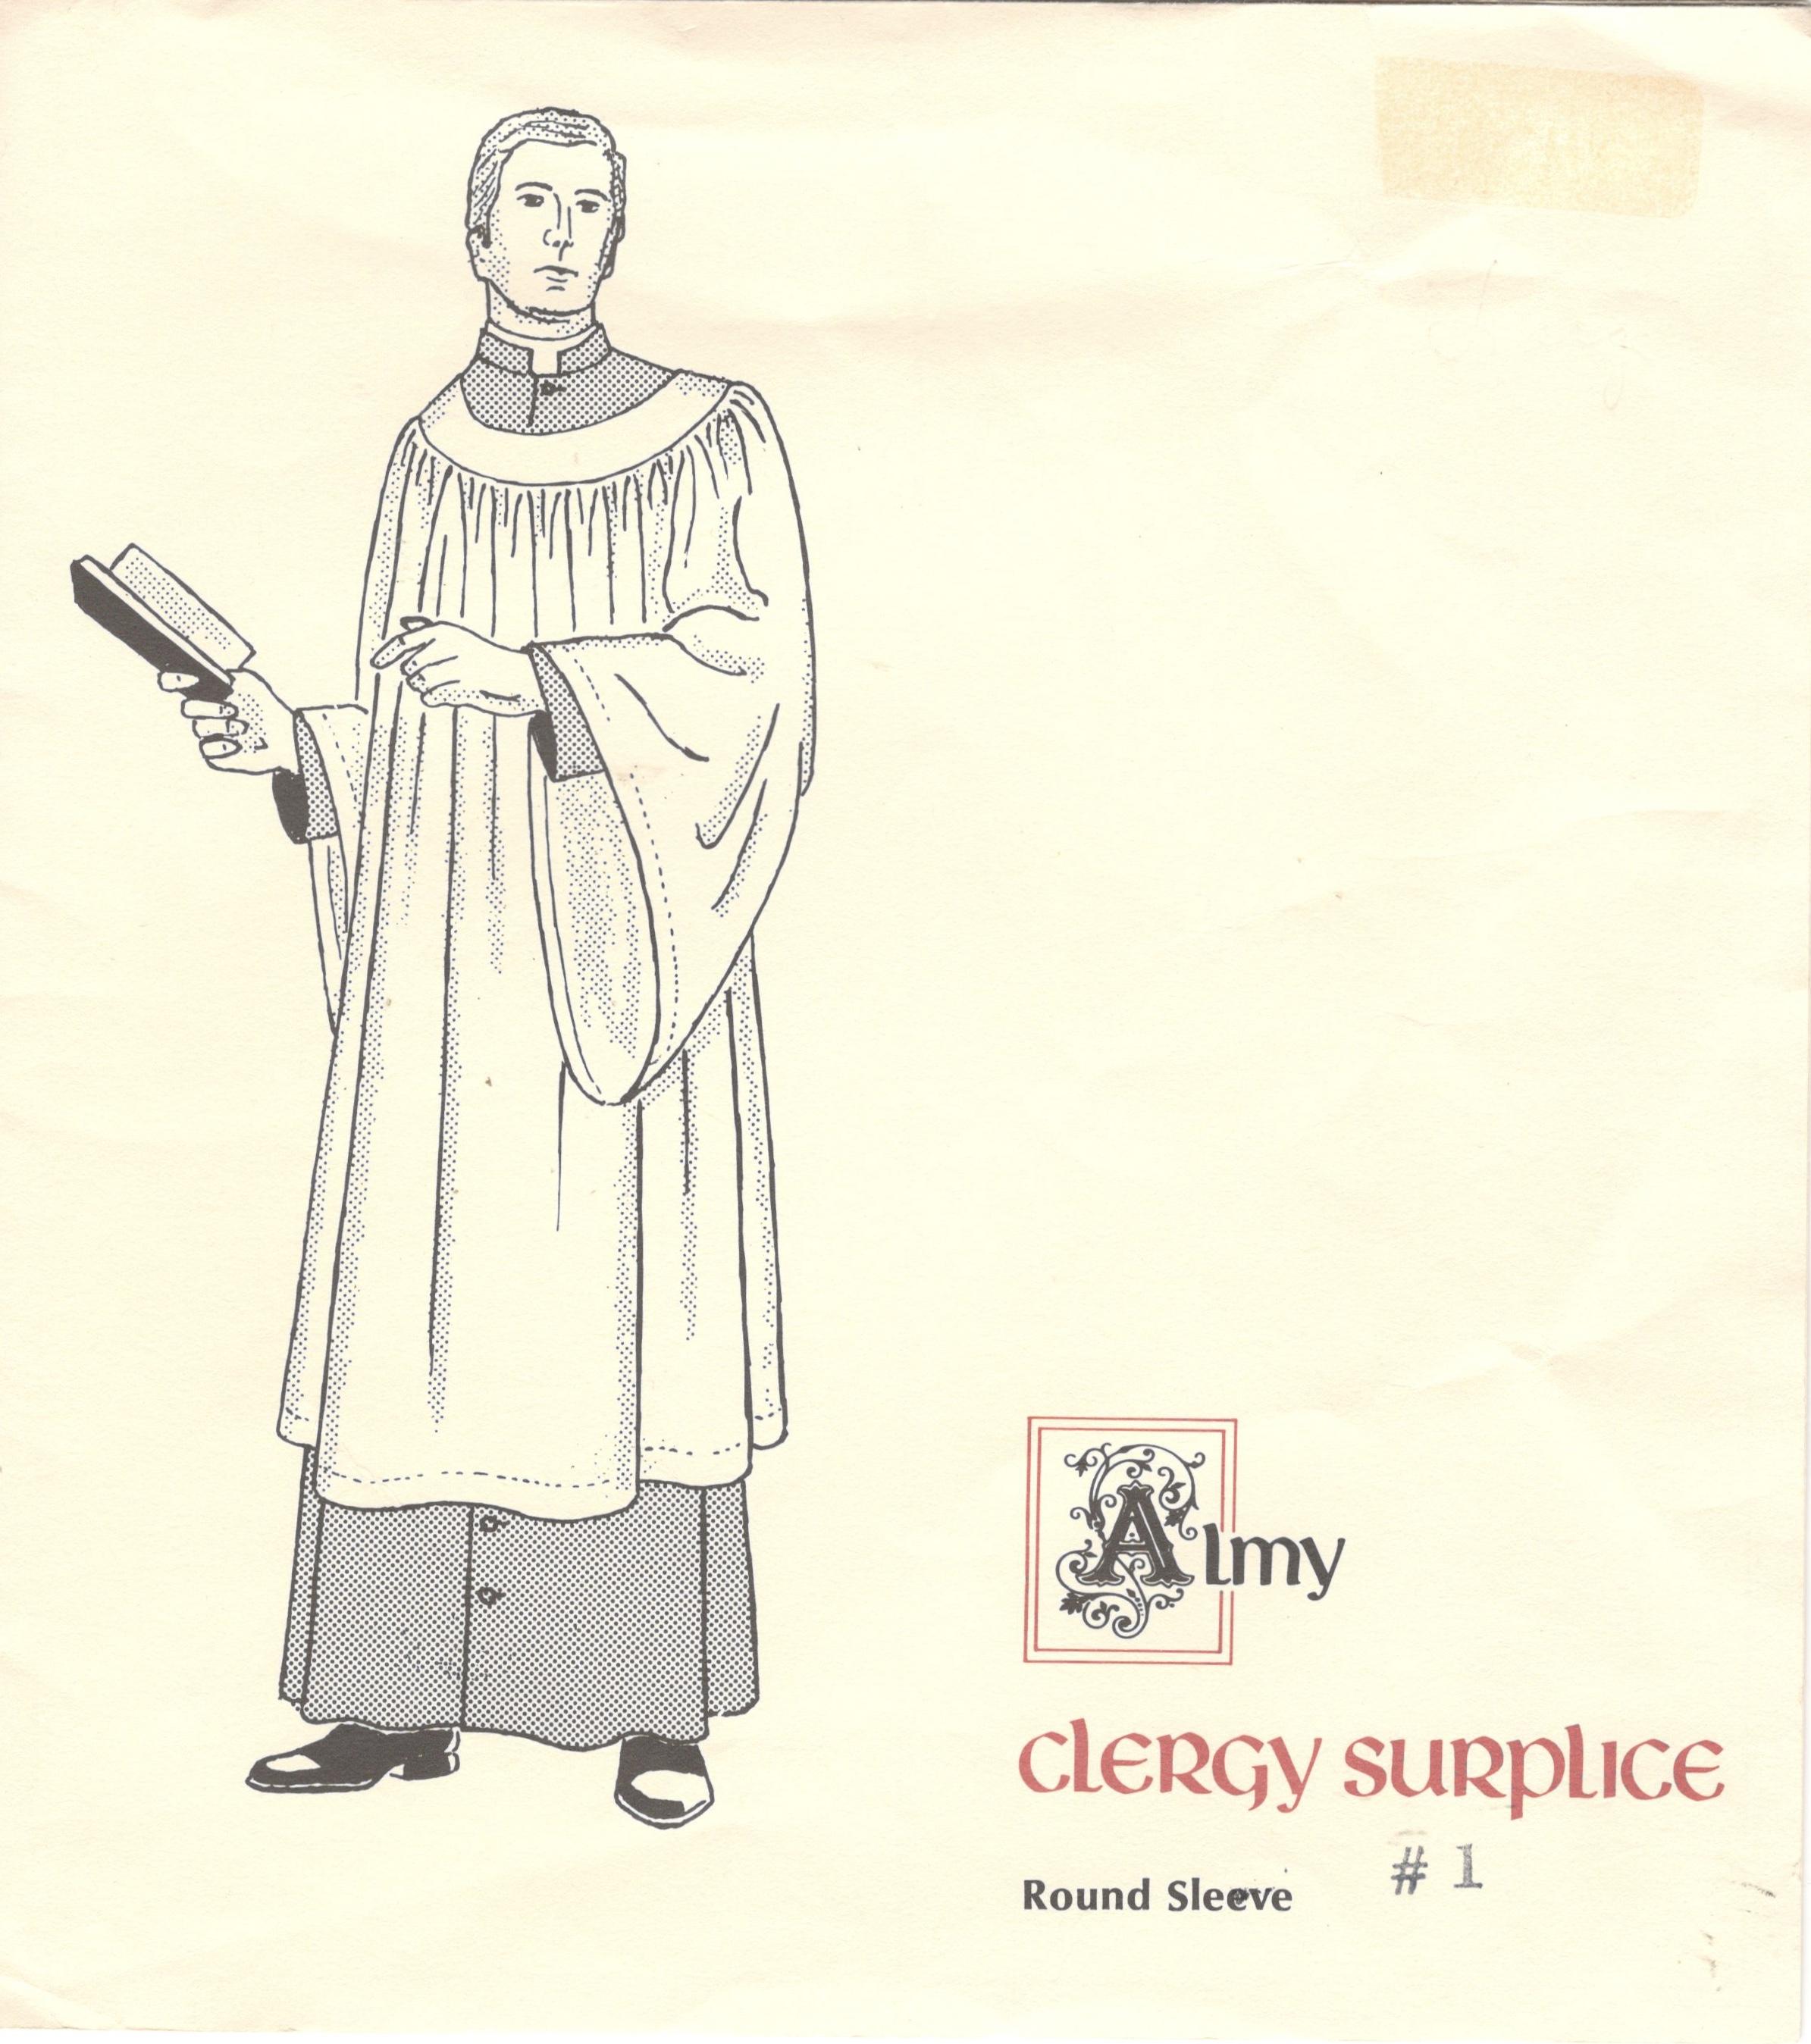 Almy 9